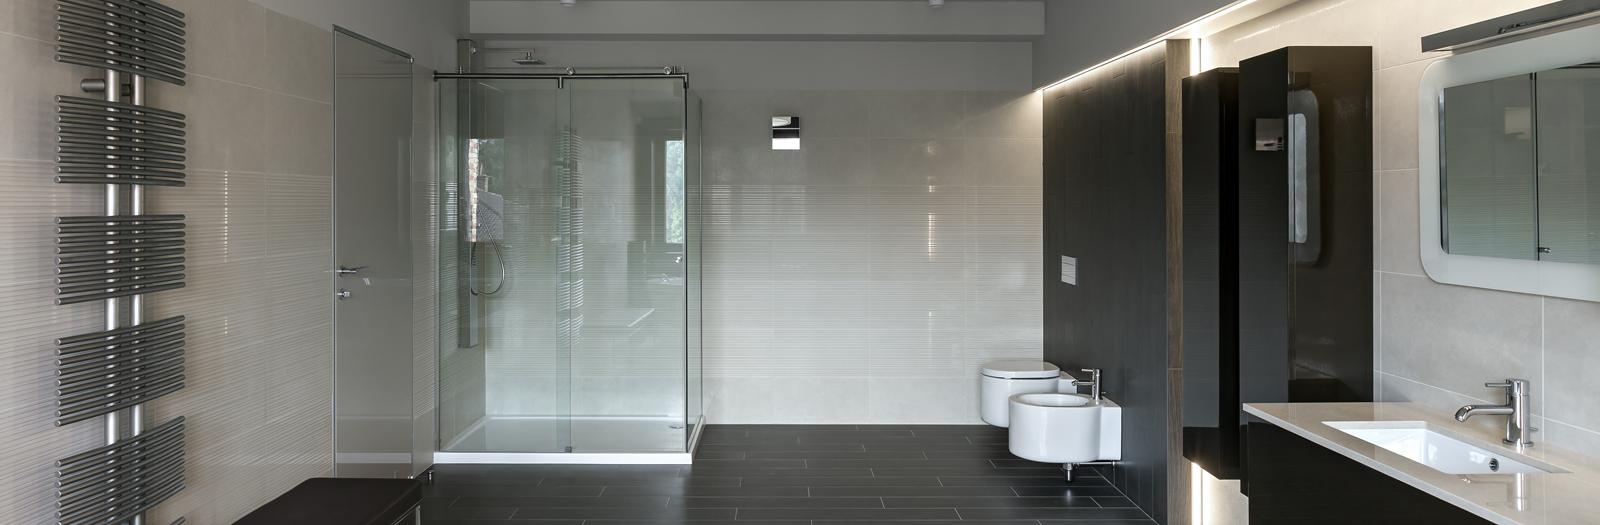 Shower doors cape town shower doors pro fit for Kitchen doors cape town